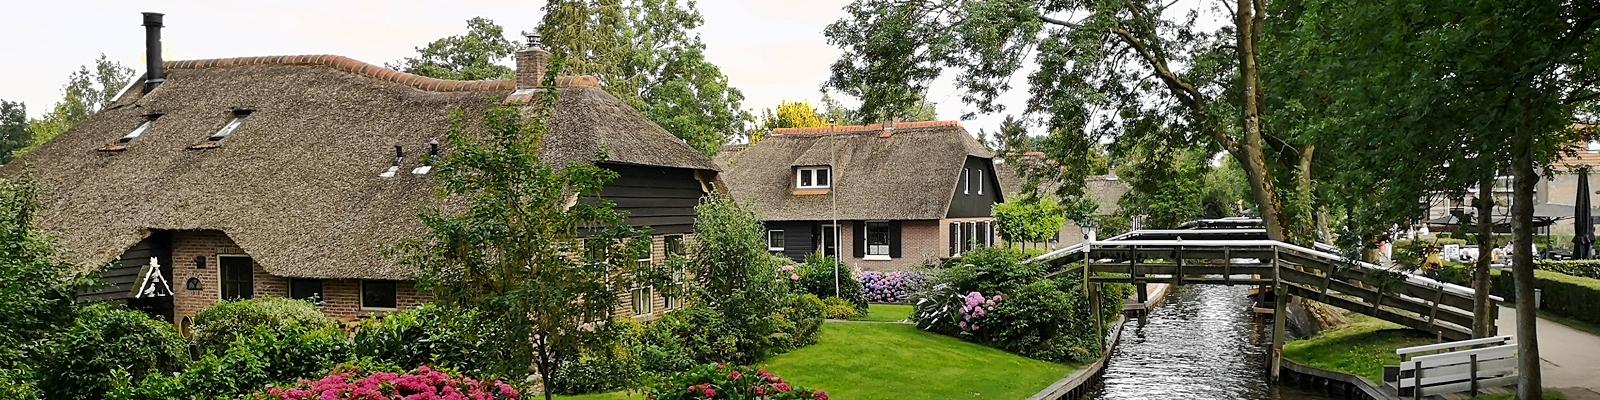 Dorpgracht, Giethoorn